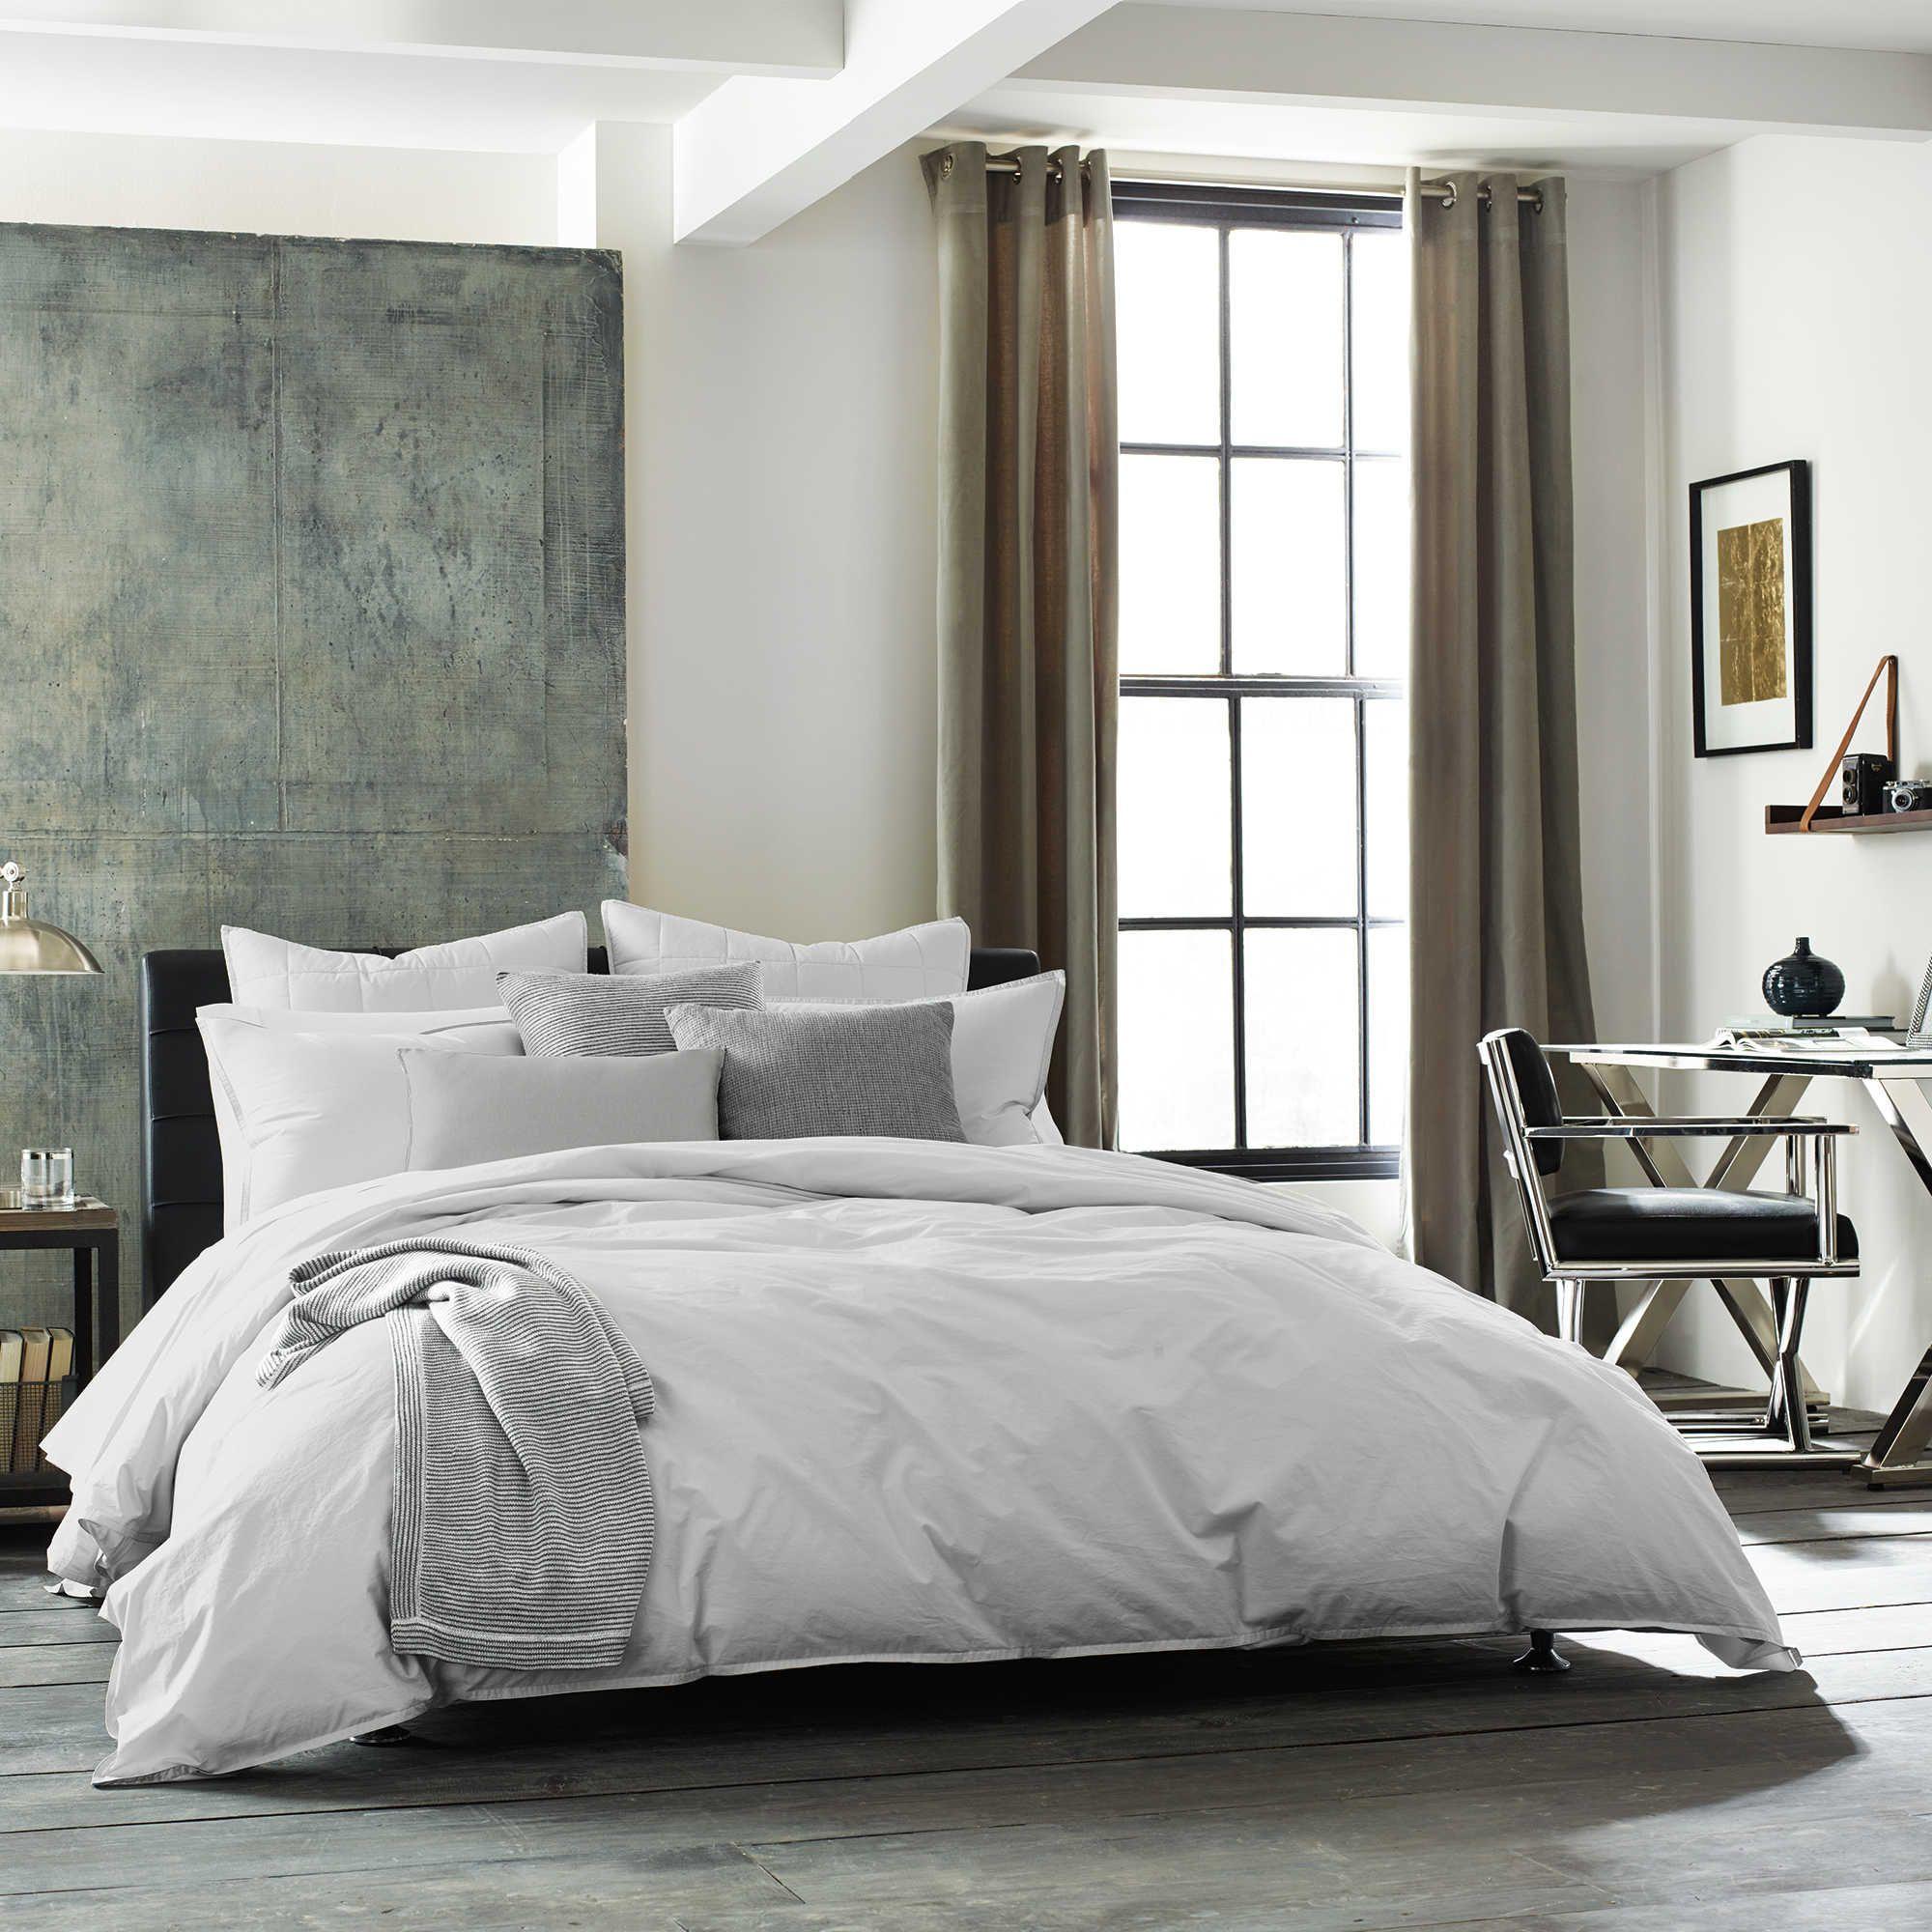 covers white rnloka s ikea duvet bj cover masculine black pin and pillowcase